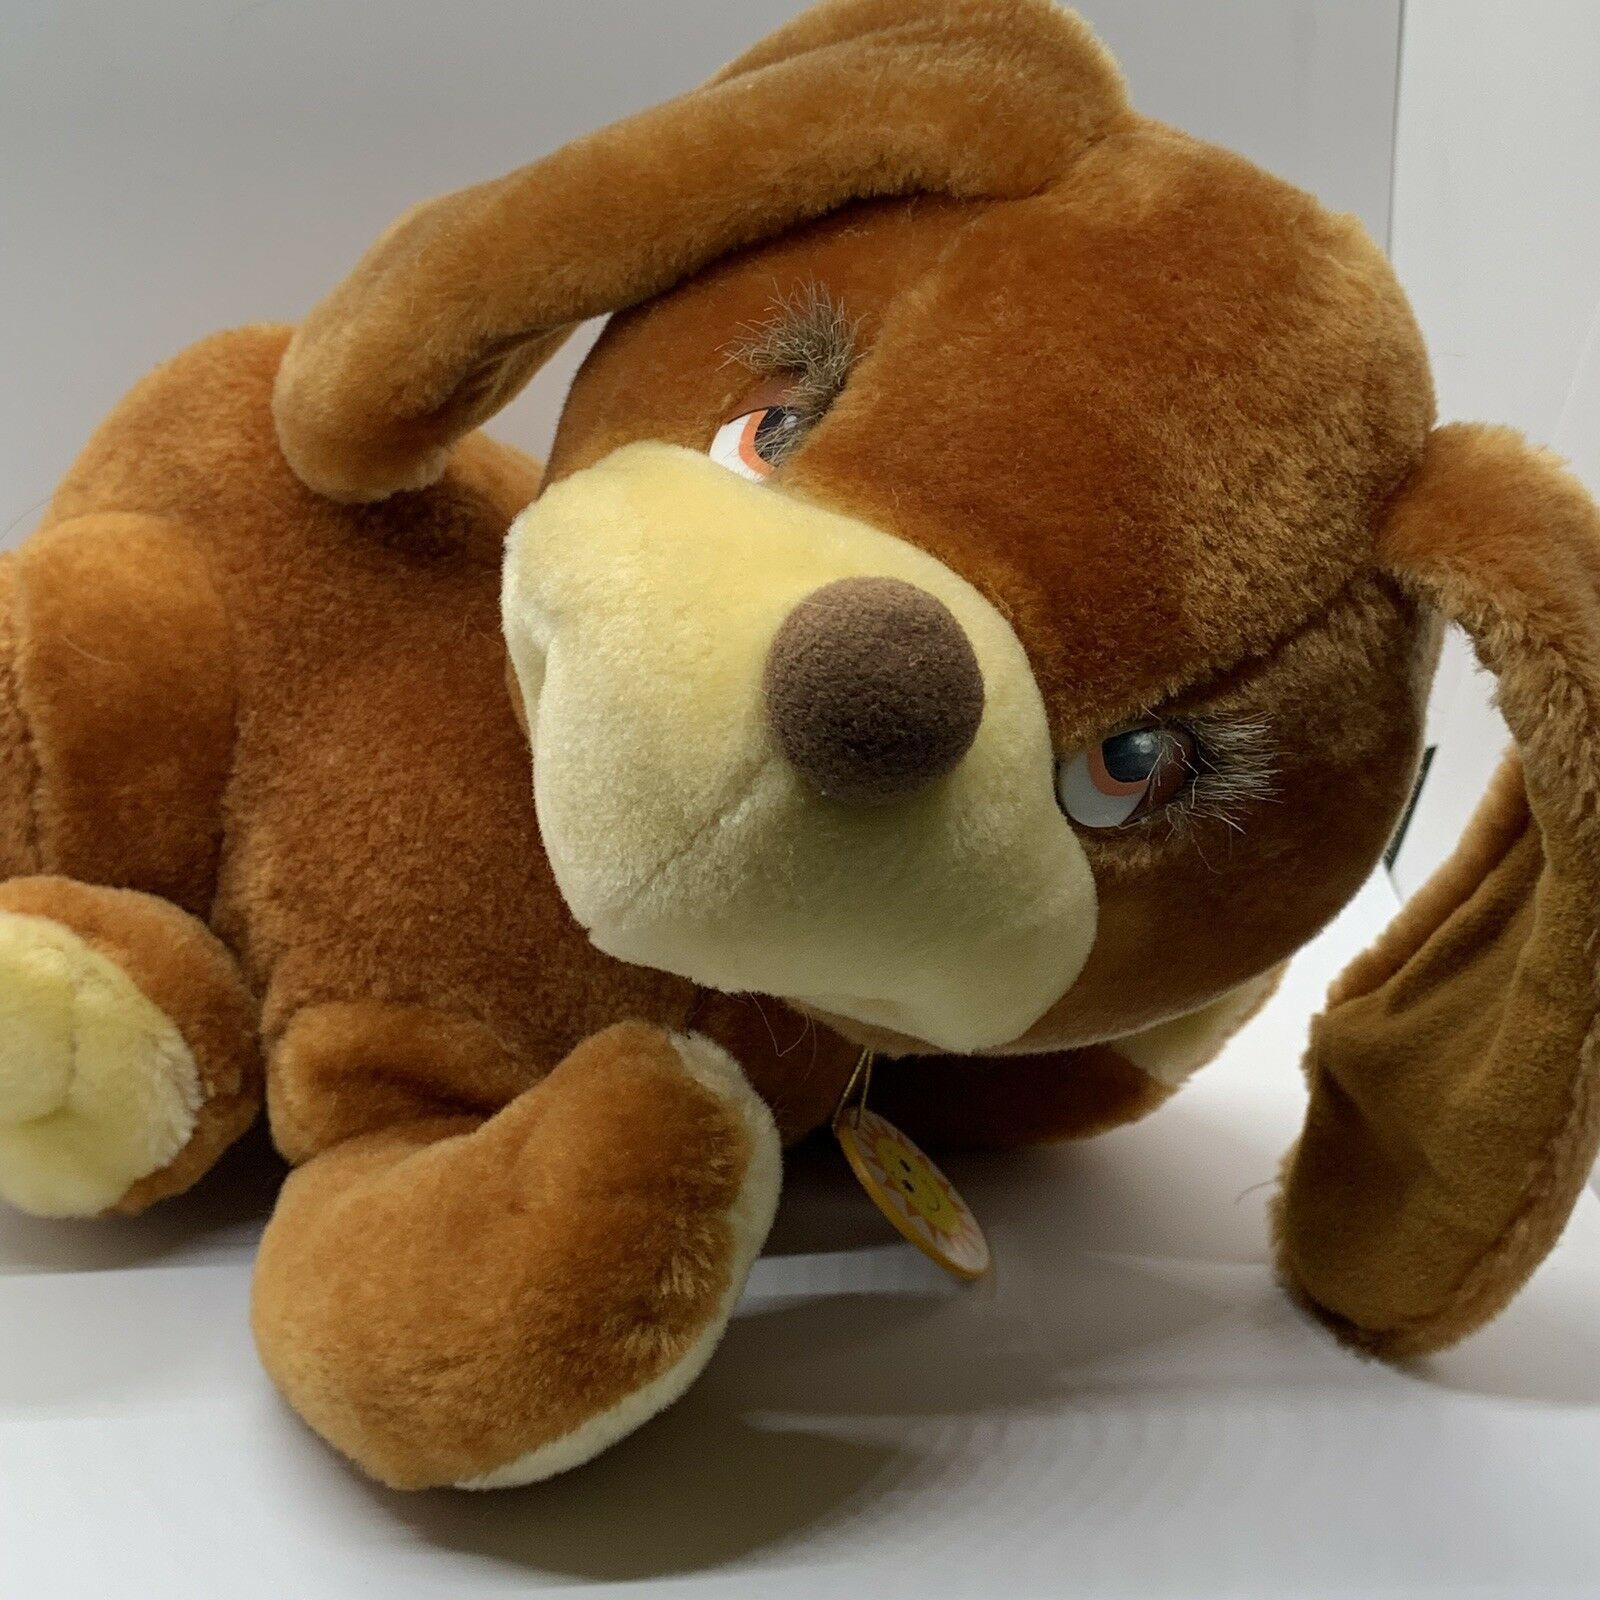 "Sunburst Pets 1983 Vintage Plush Brown Dog Commonwealth Vtg Stuffed Animal 13"" image 11"